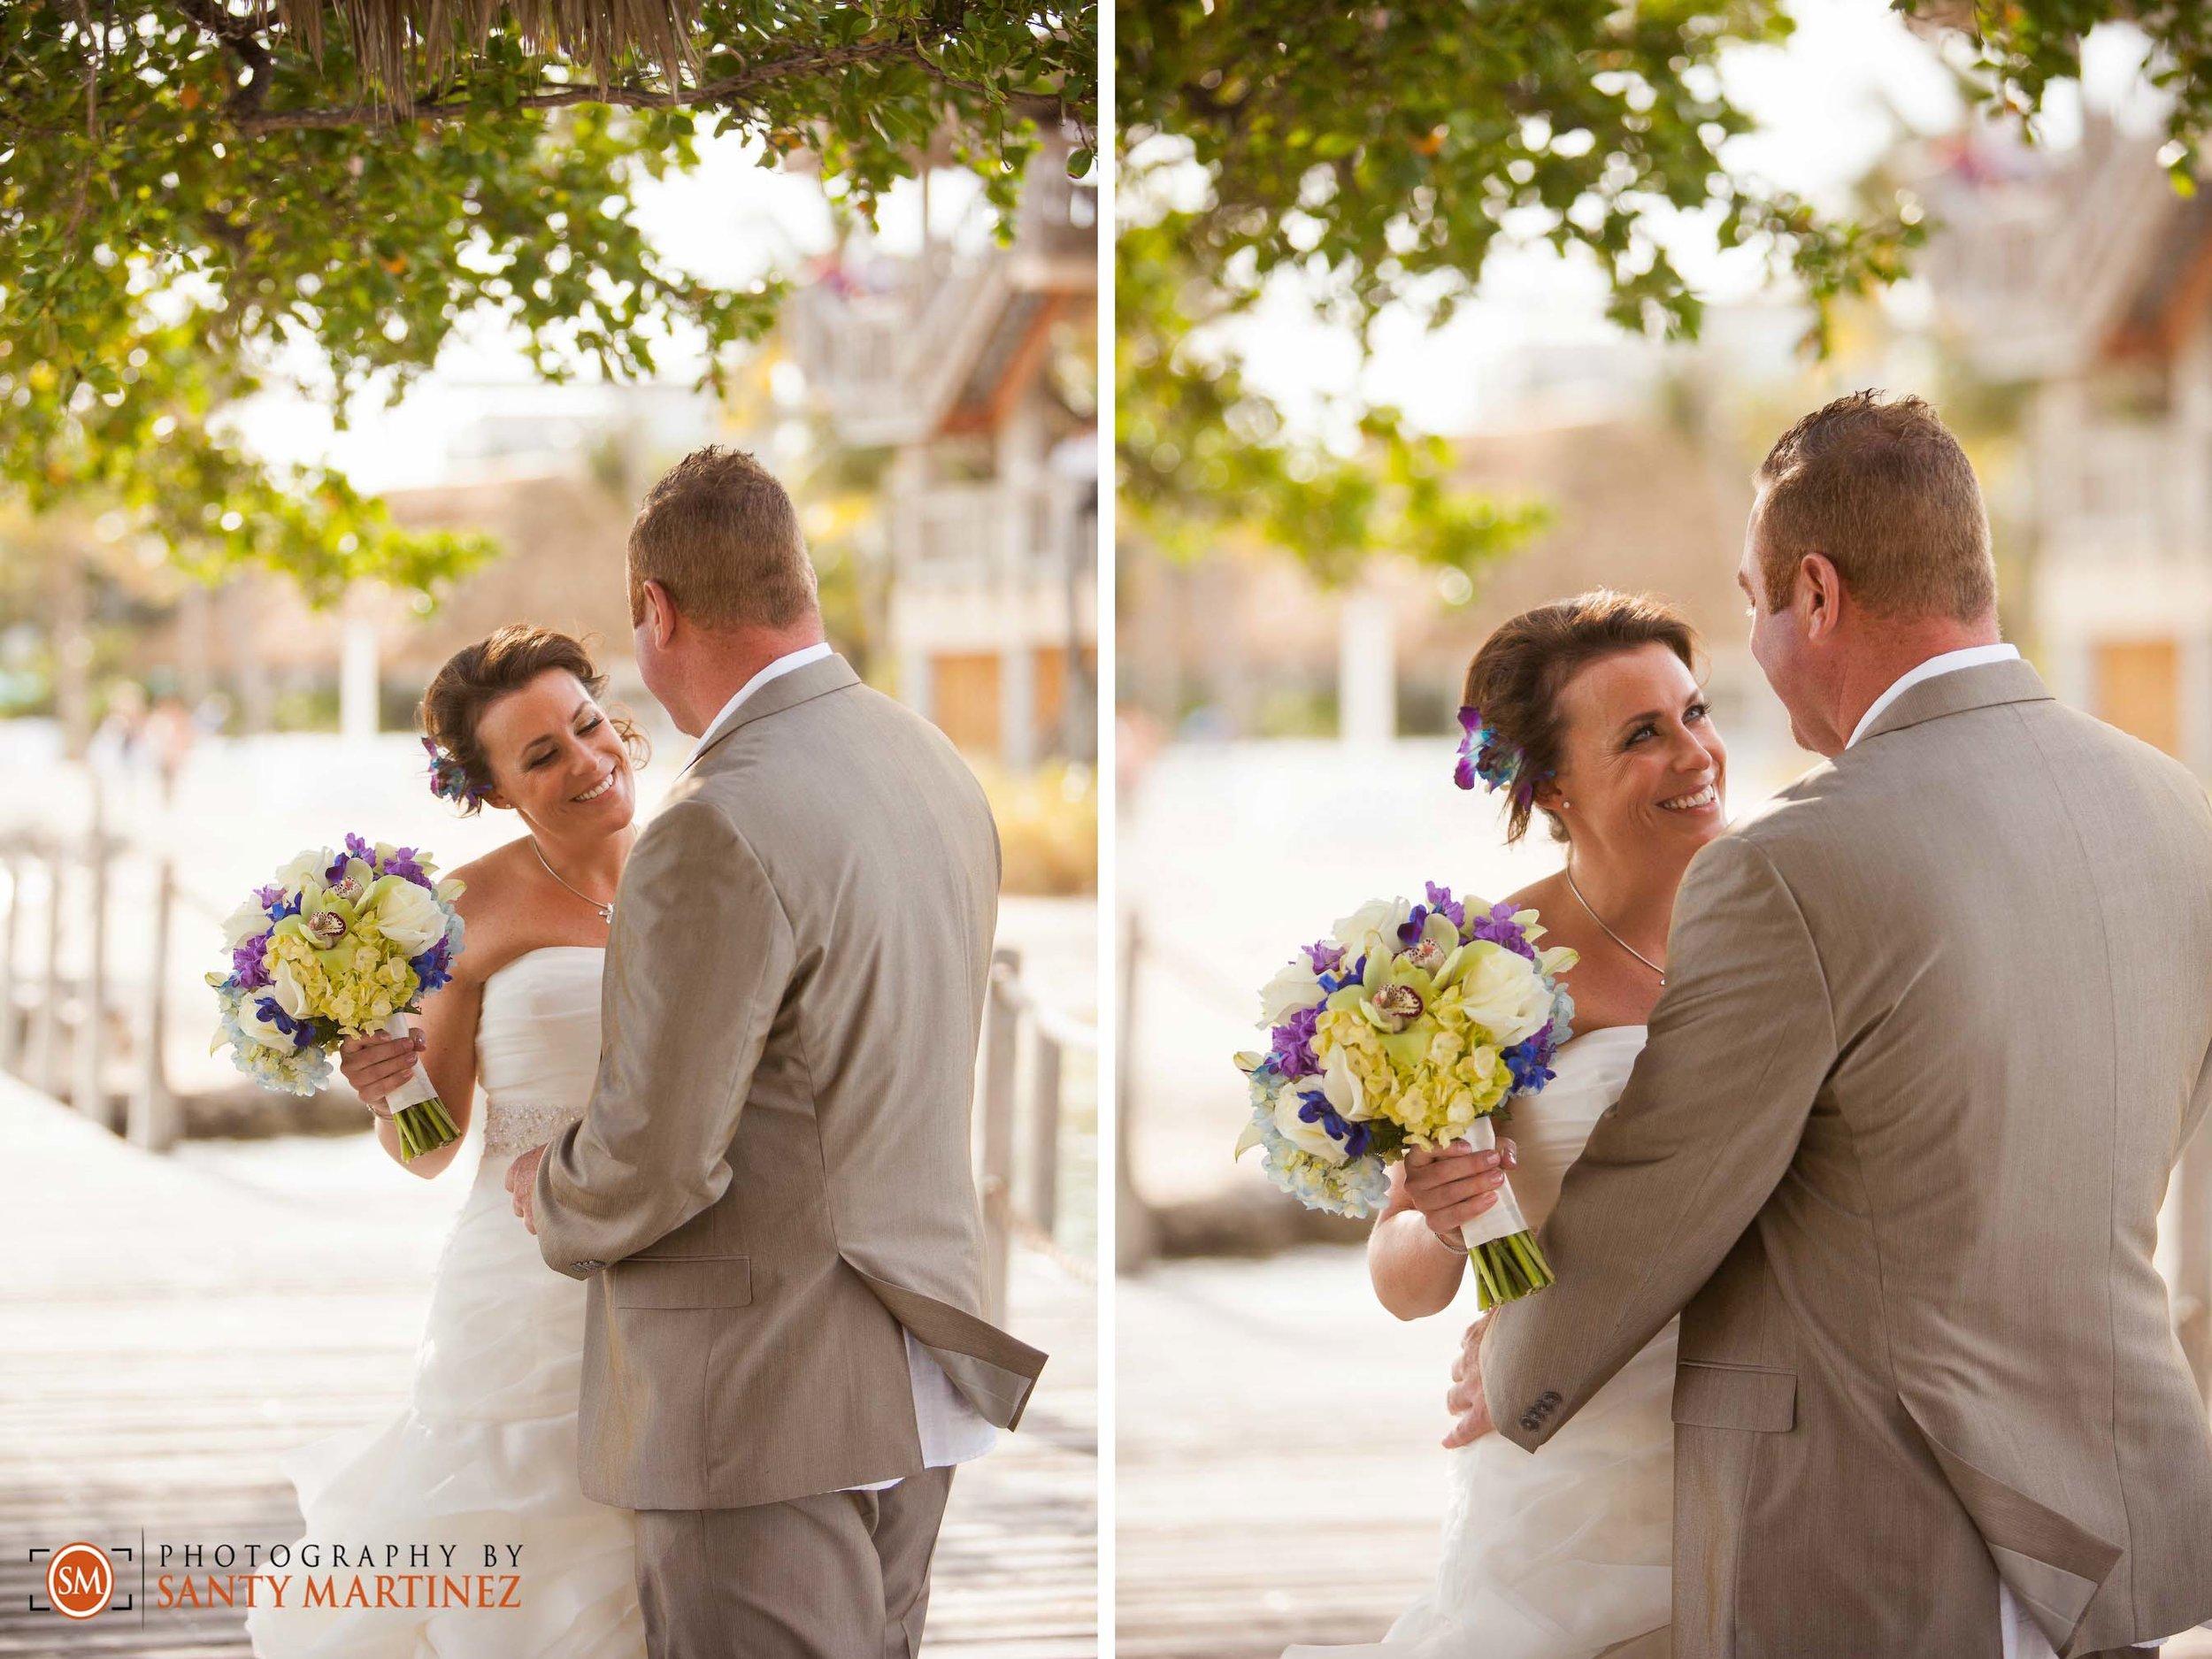 Photography by Santy Martinez - Miami Wedding Photographer-016-1.jpg